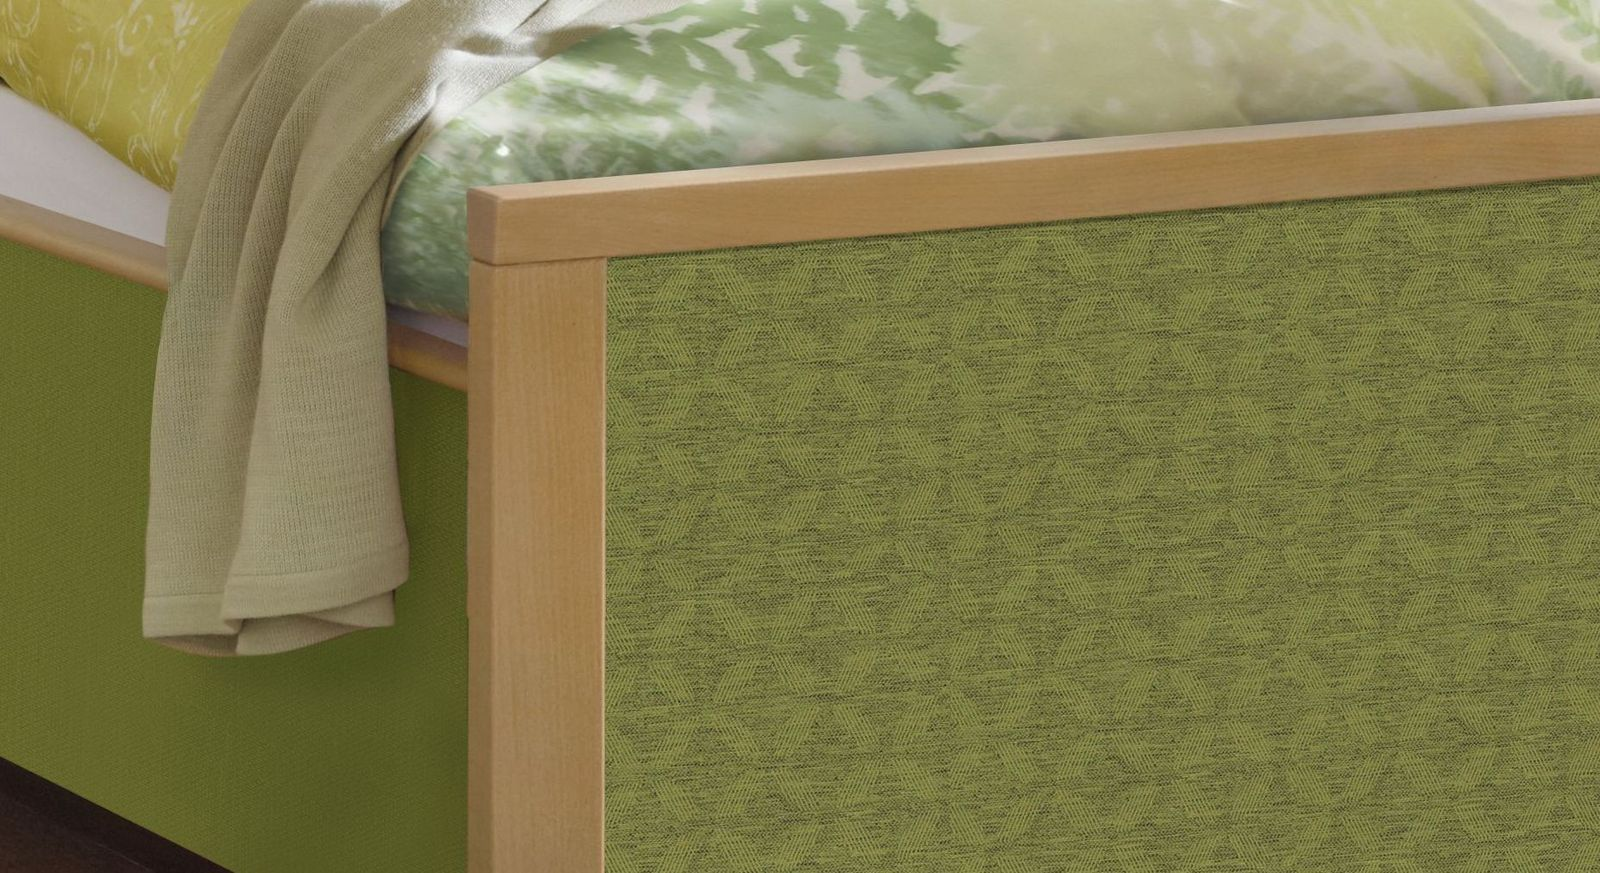 Komfortbett mit Pflegebett-Funktion Mainau inklusive Fußteil